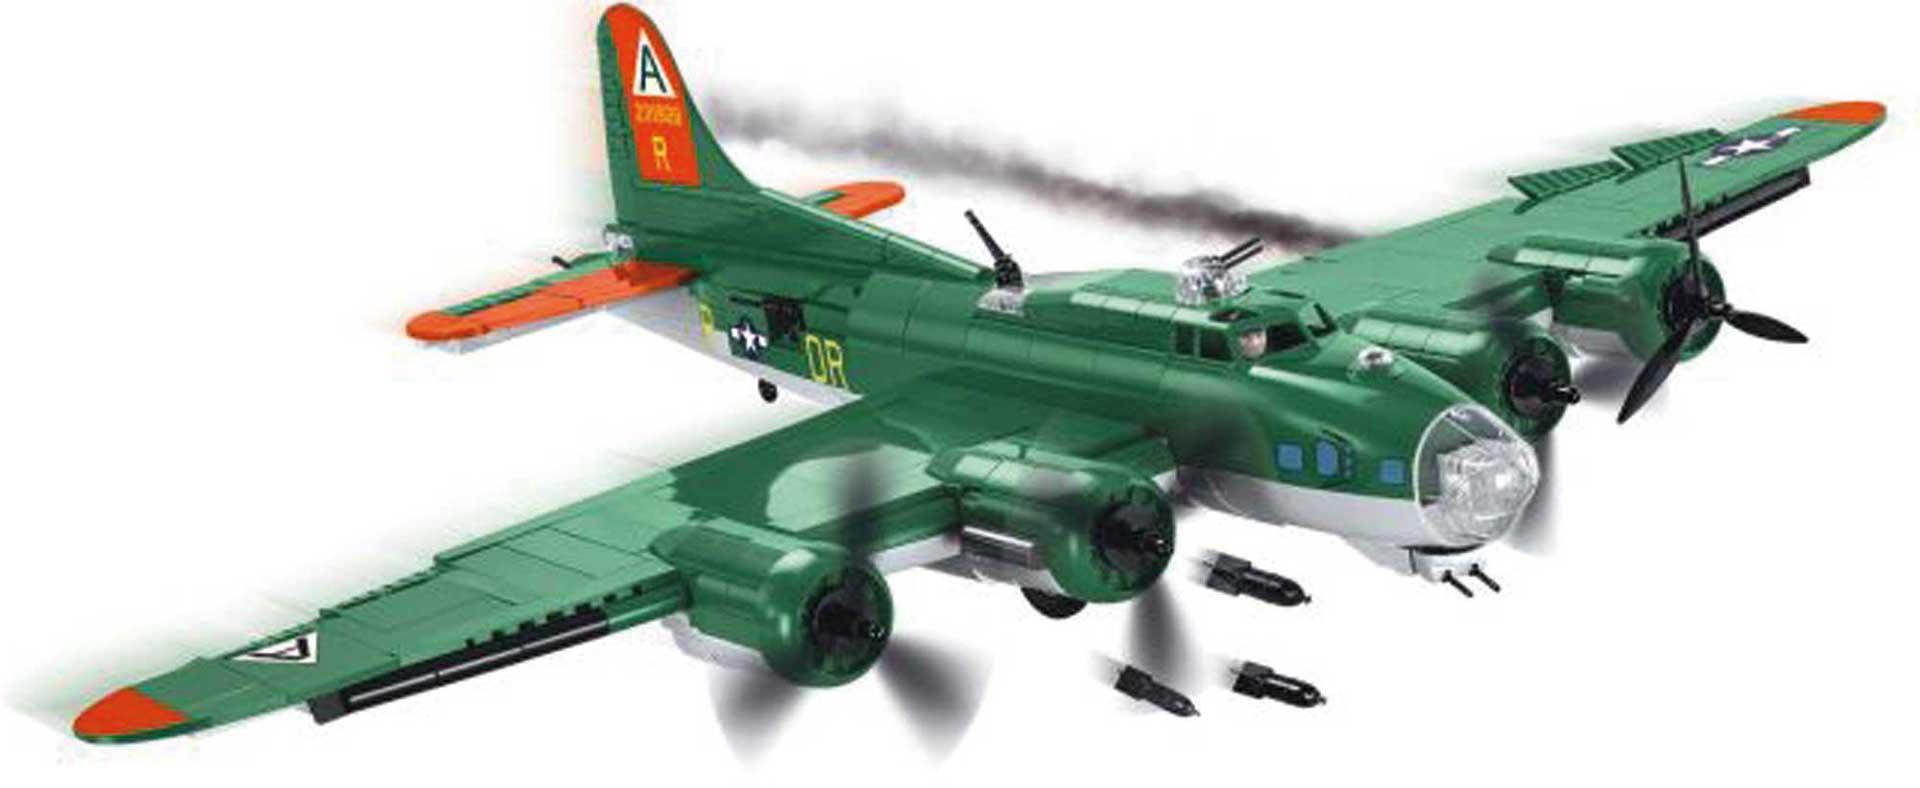 COBI Boeing B-17G Flying Fortress (920 Teile) Klemmbausteine